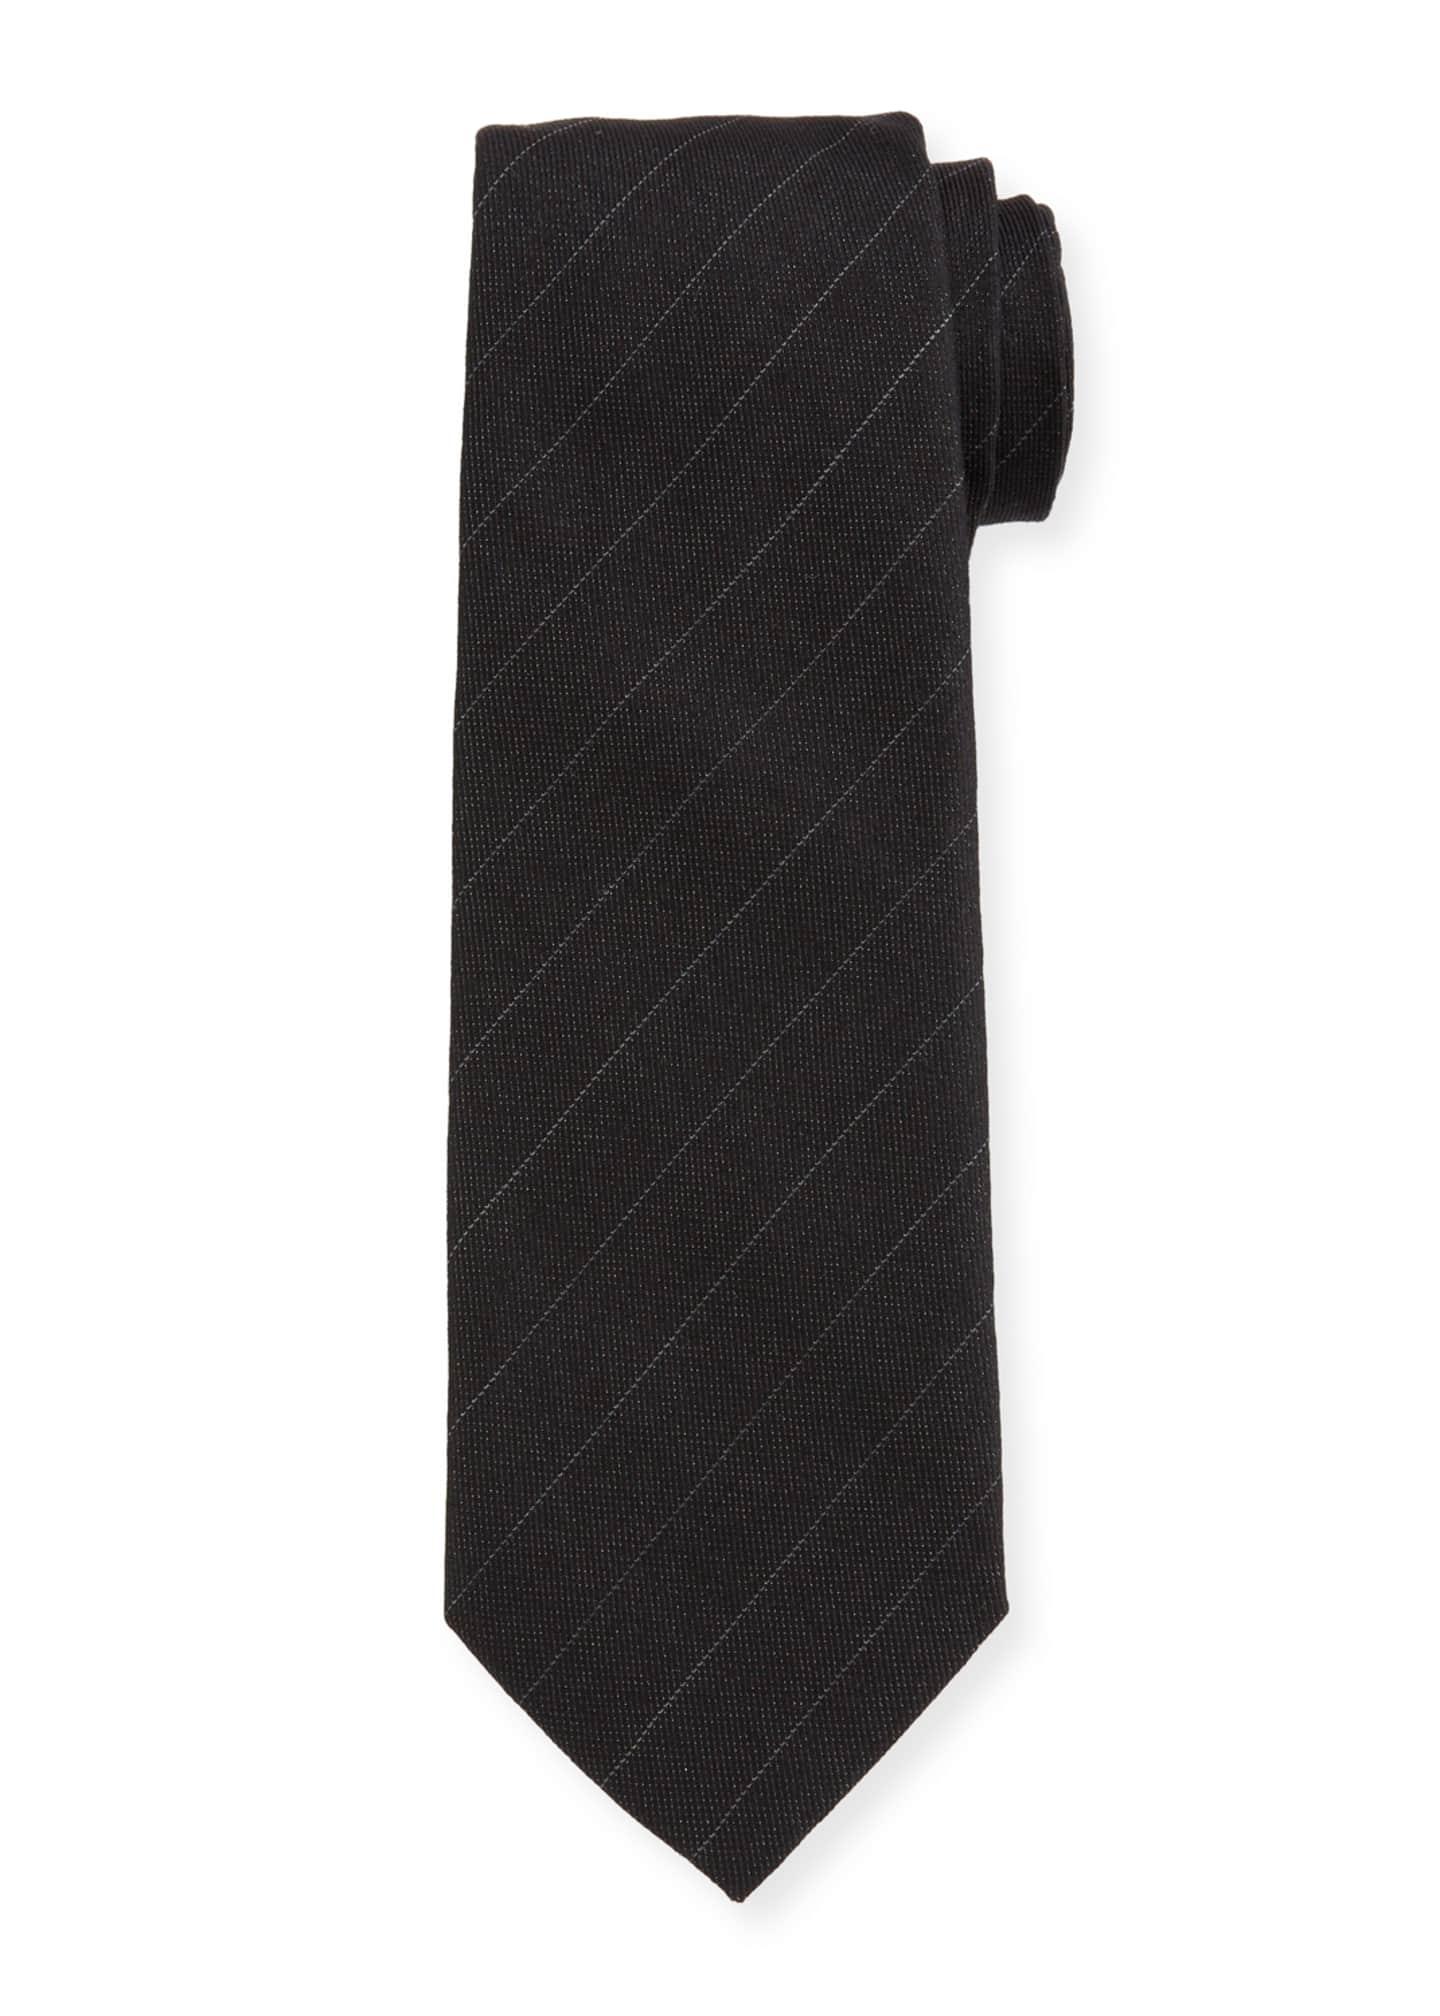 Berluti Men's Pinstripe Wool Tie